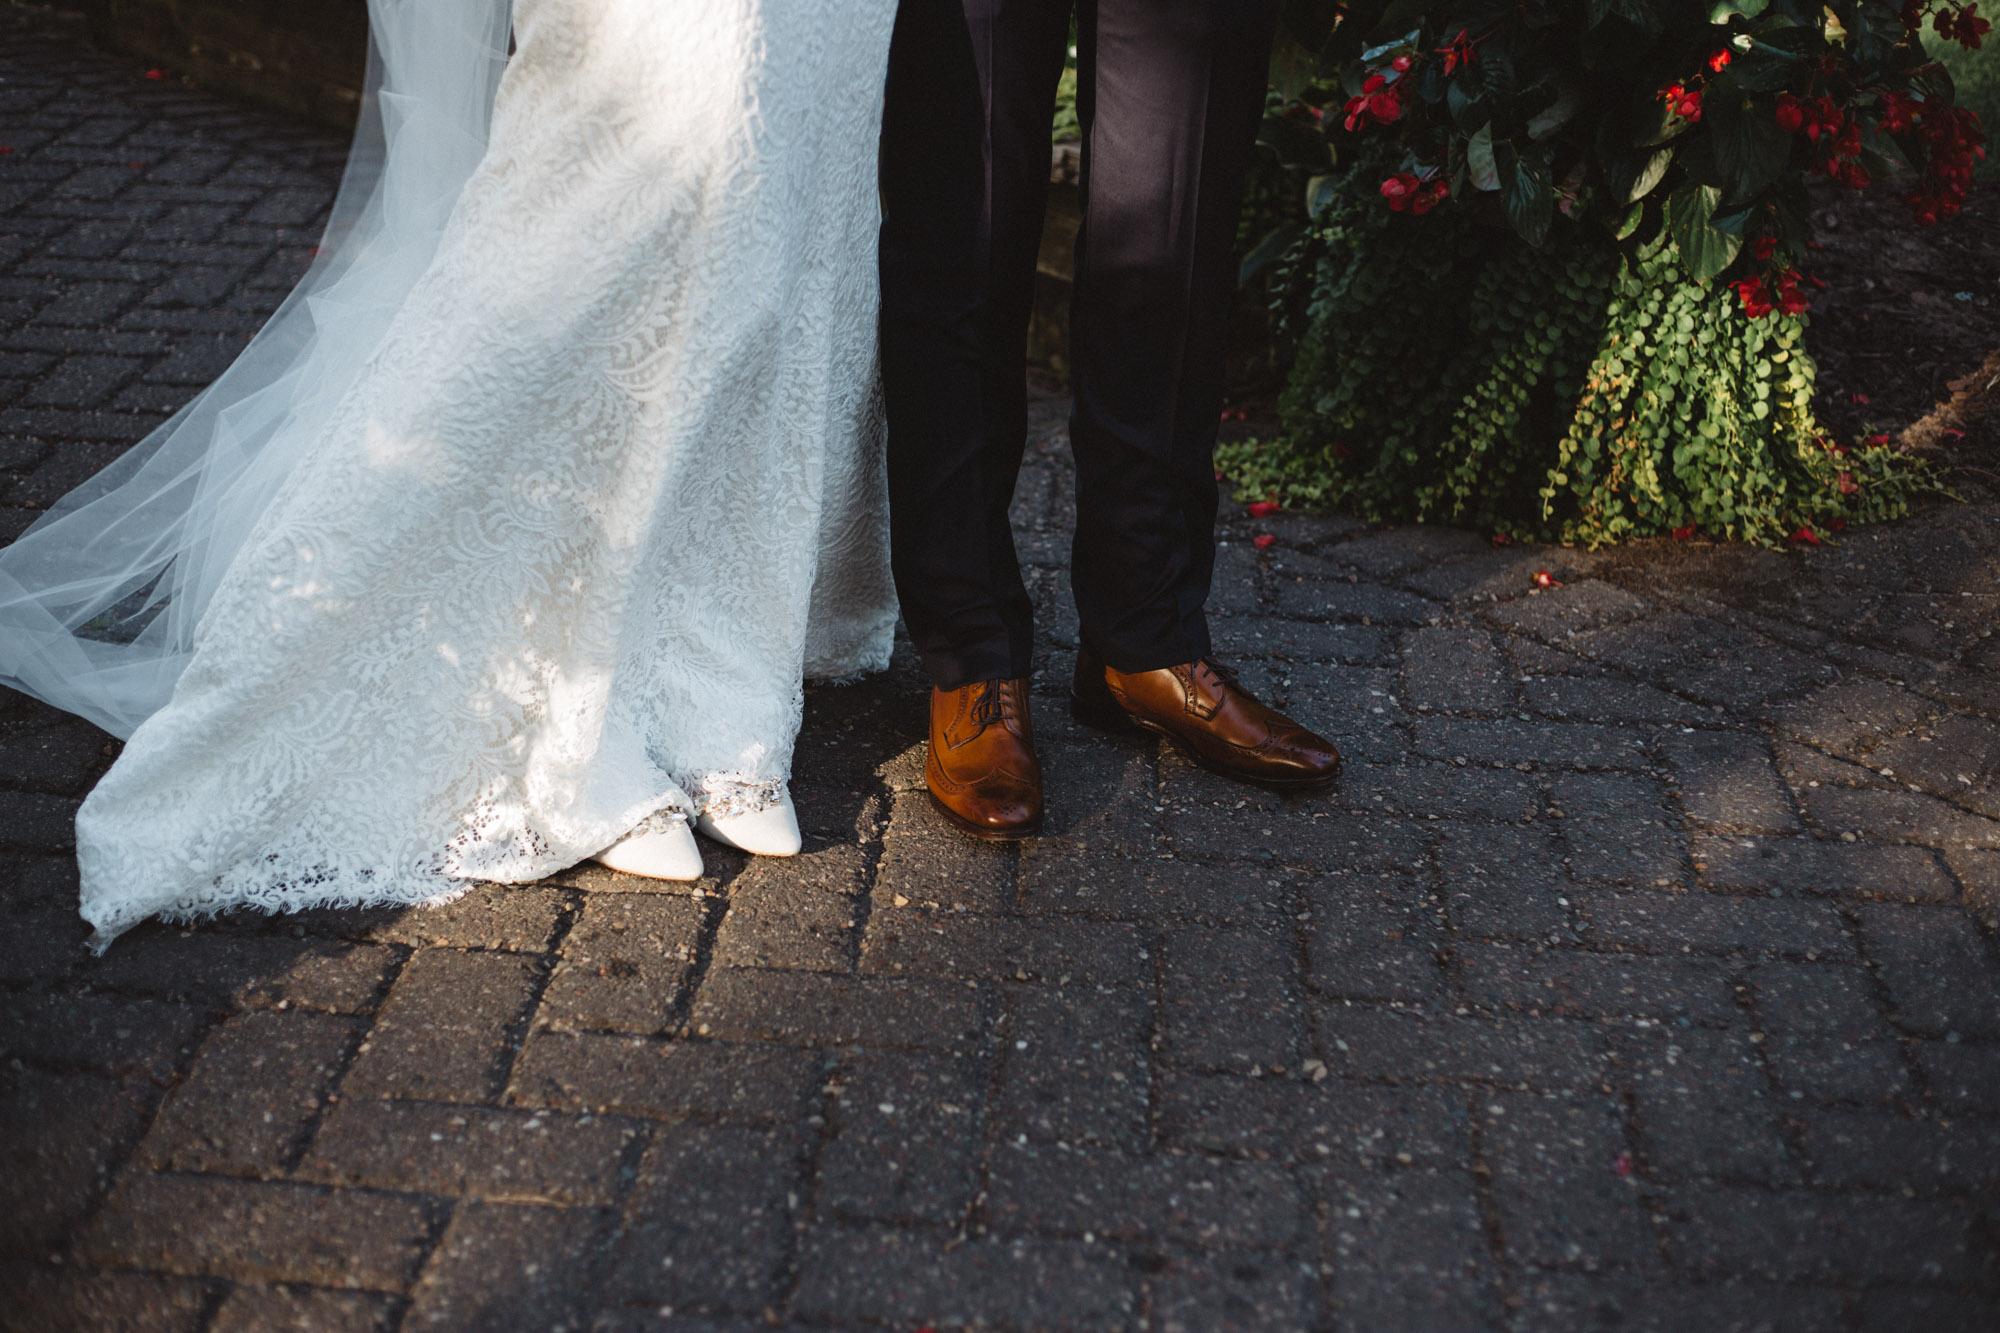 Unconventional destination wedding photography by Britt DeZeeuw, Grand View Lodge wedding photographer